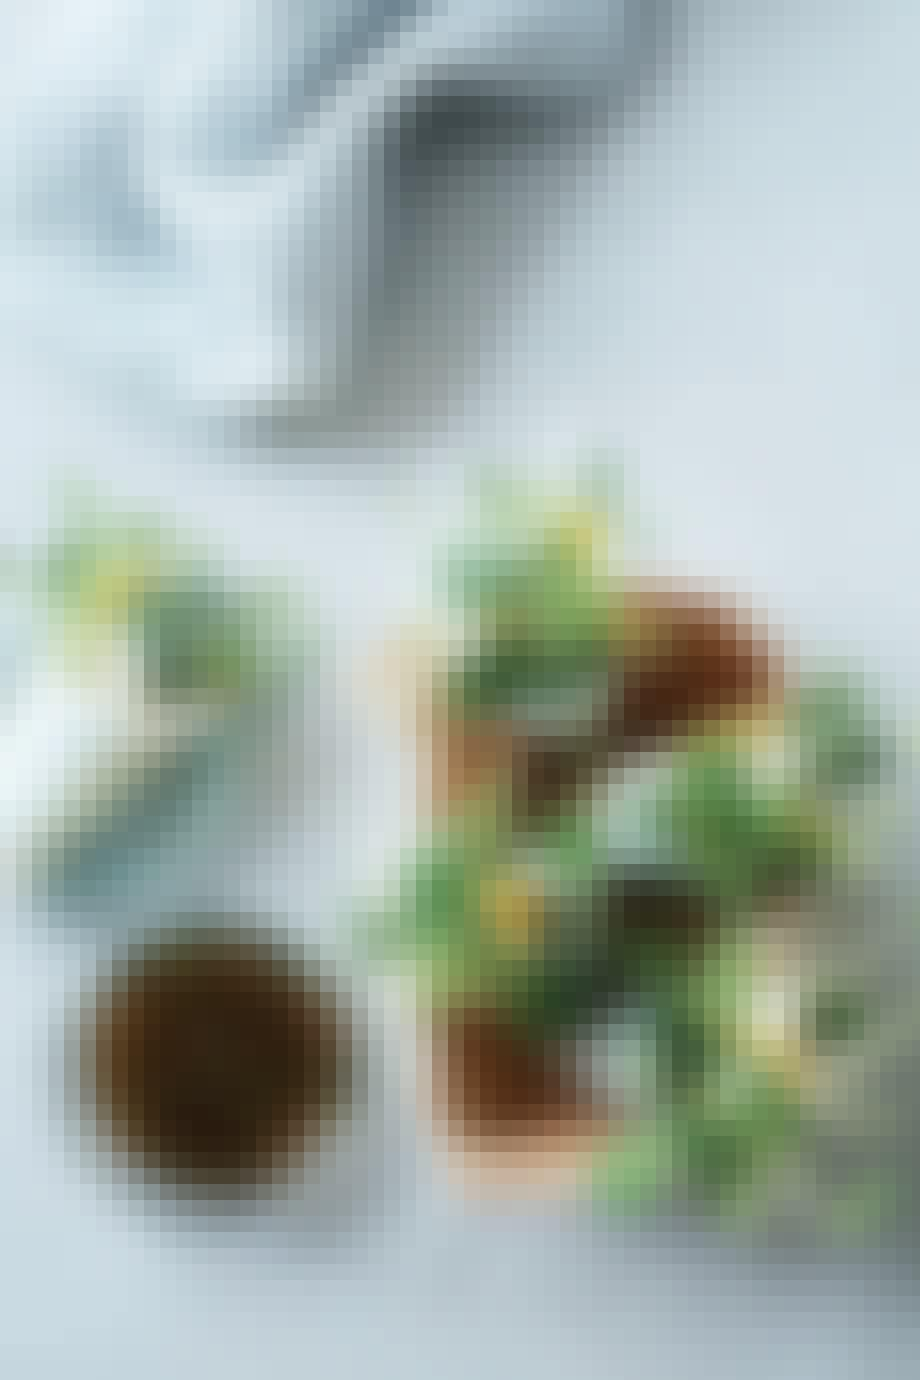 Rispapirwraps med kylling og urter